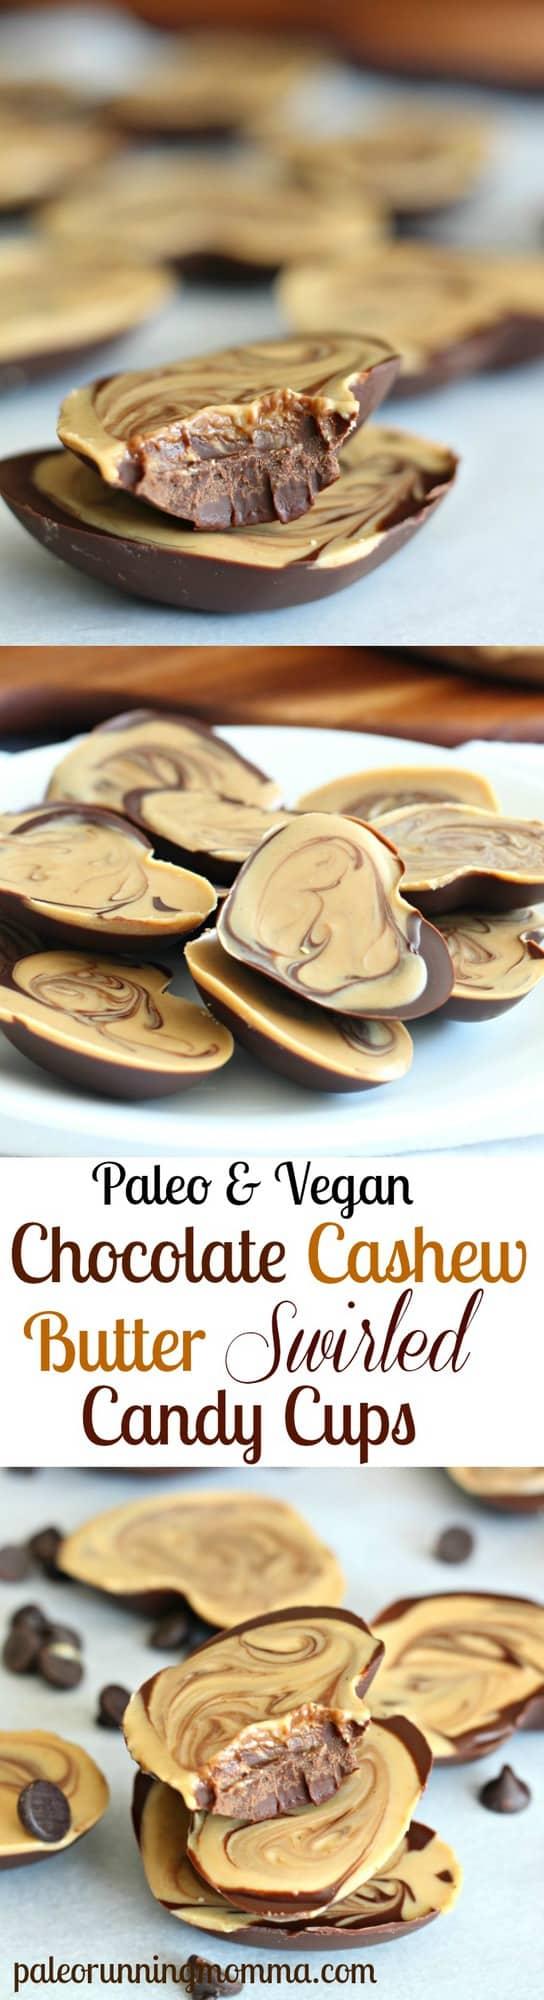 Paleo & Vegan Chocolate Cashew Butter Swirled Candy Cups - So rich and creamy! #dairyfree #grainfree #glutenfree #vegan #paleo #cleaneating